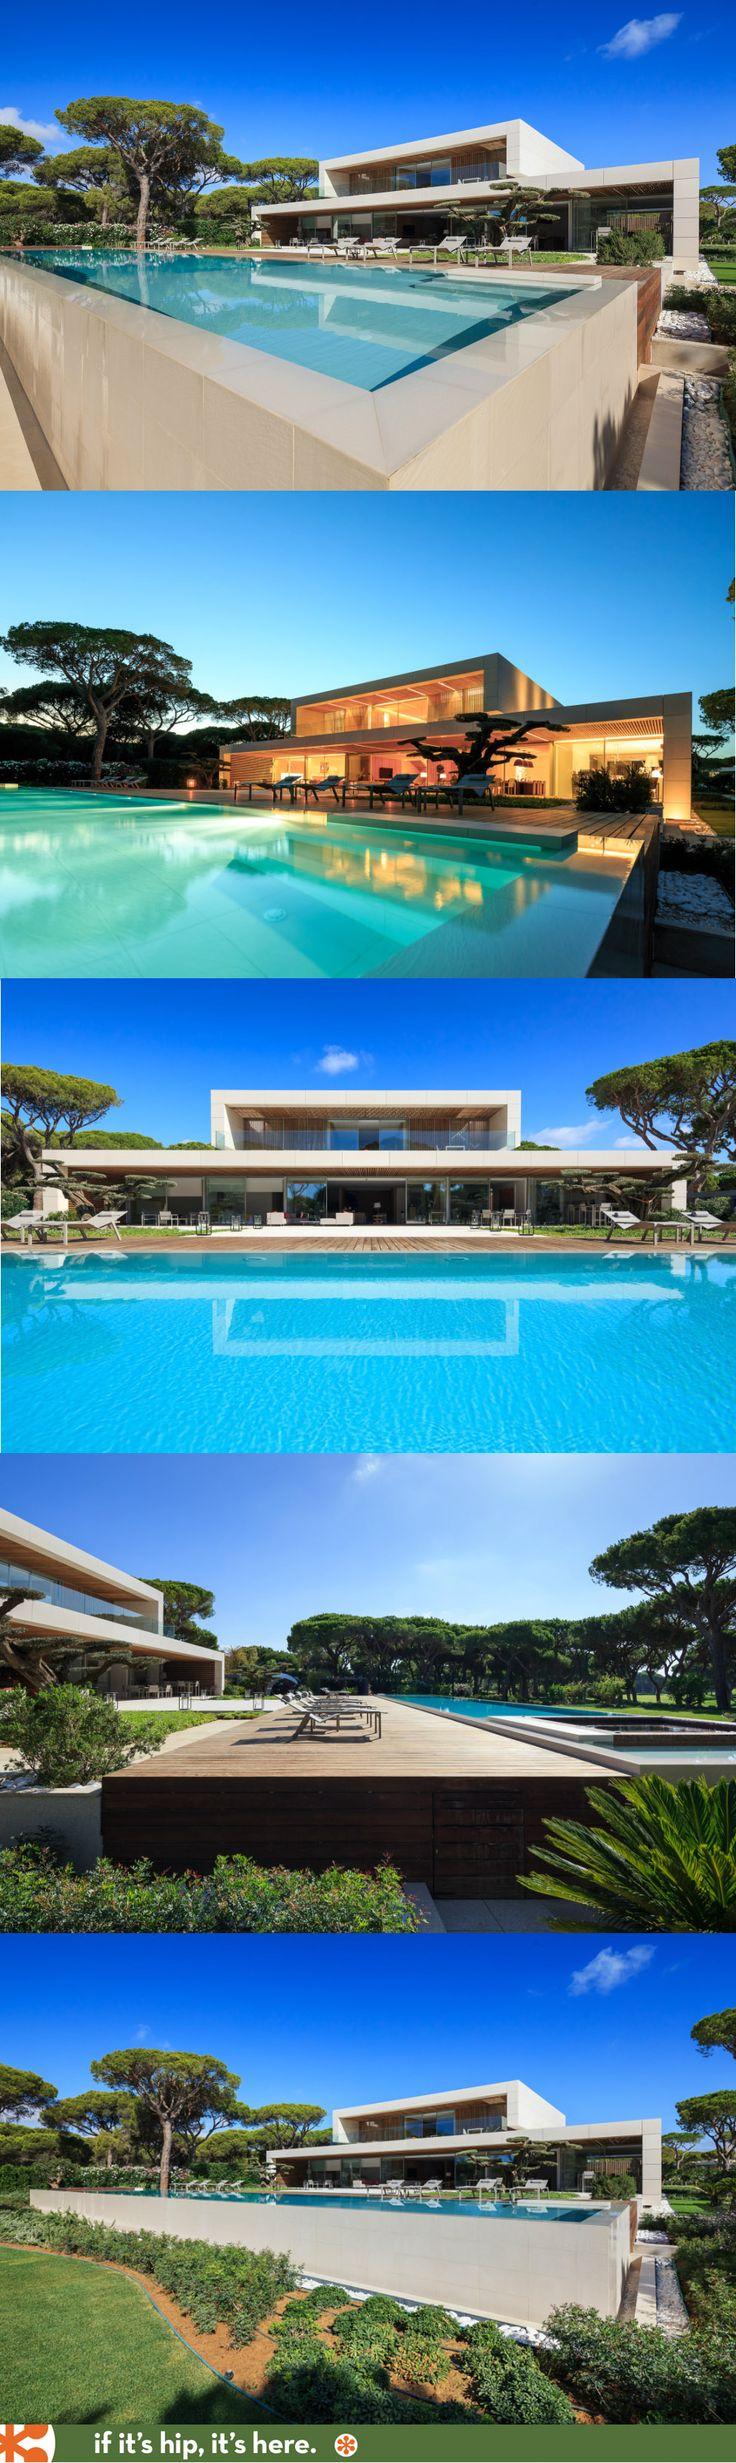 Pool at a Modern Villa by ARQUI+